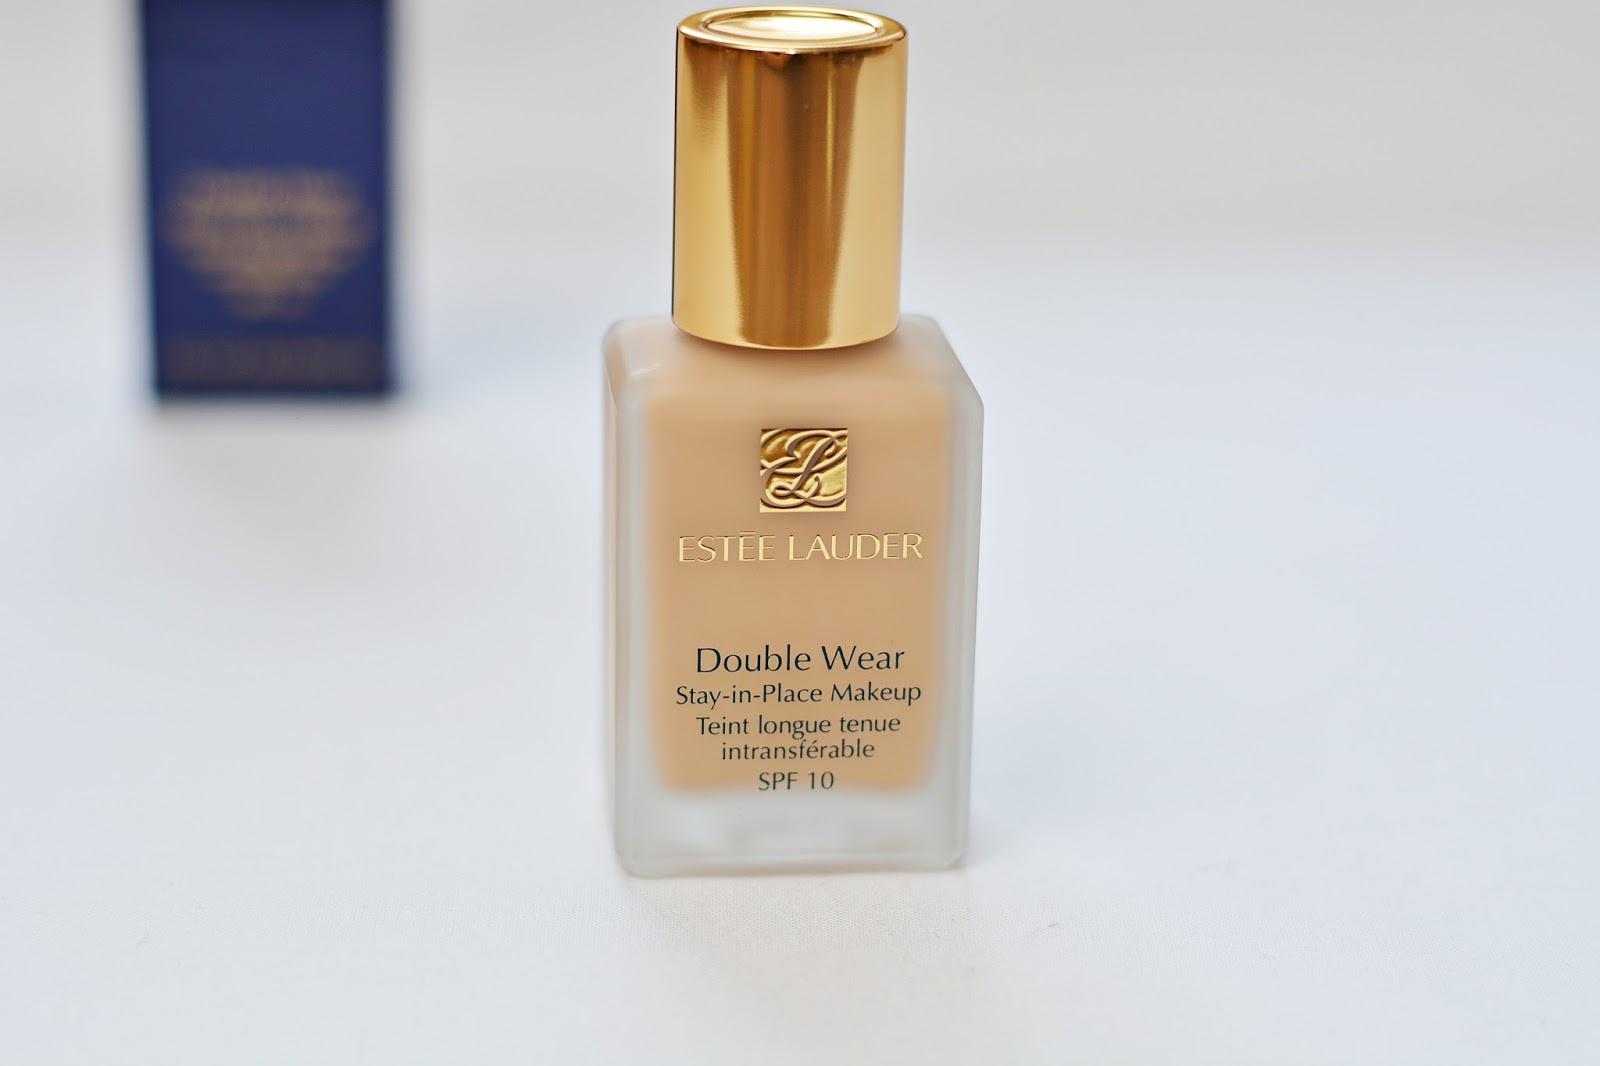 Estee Lauder Double Wear podkład blog